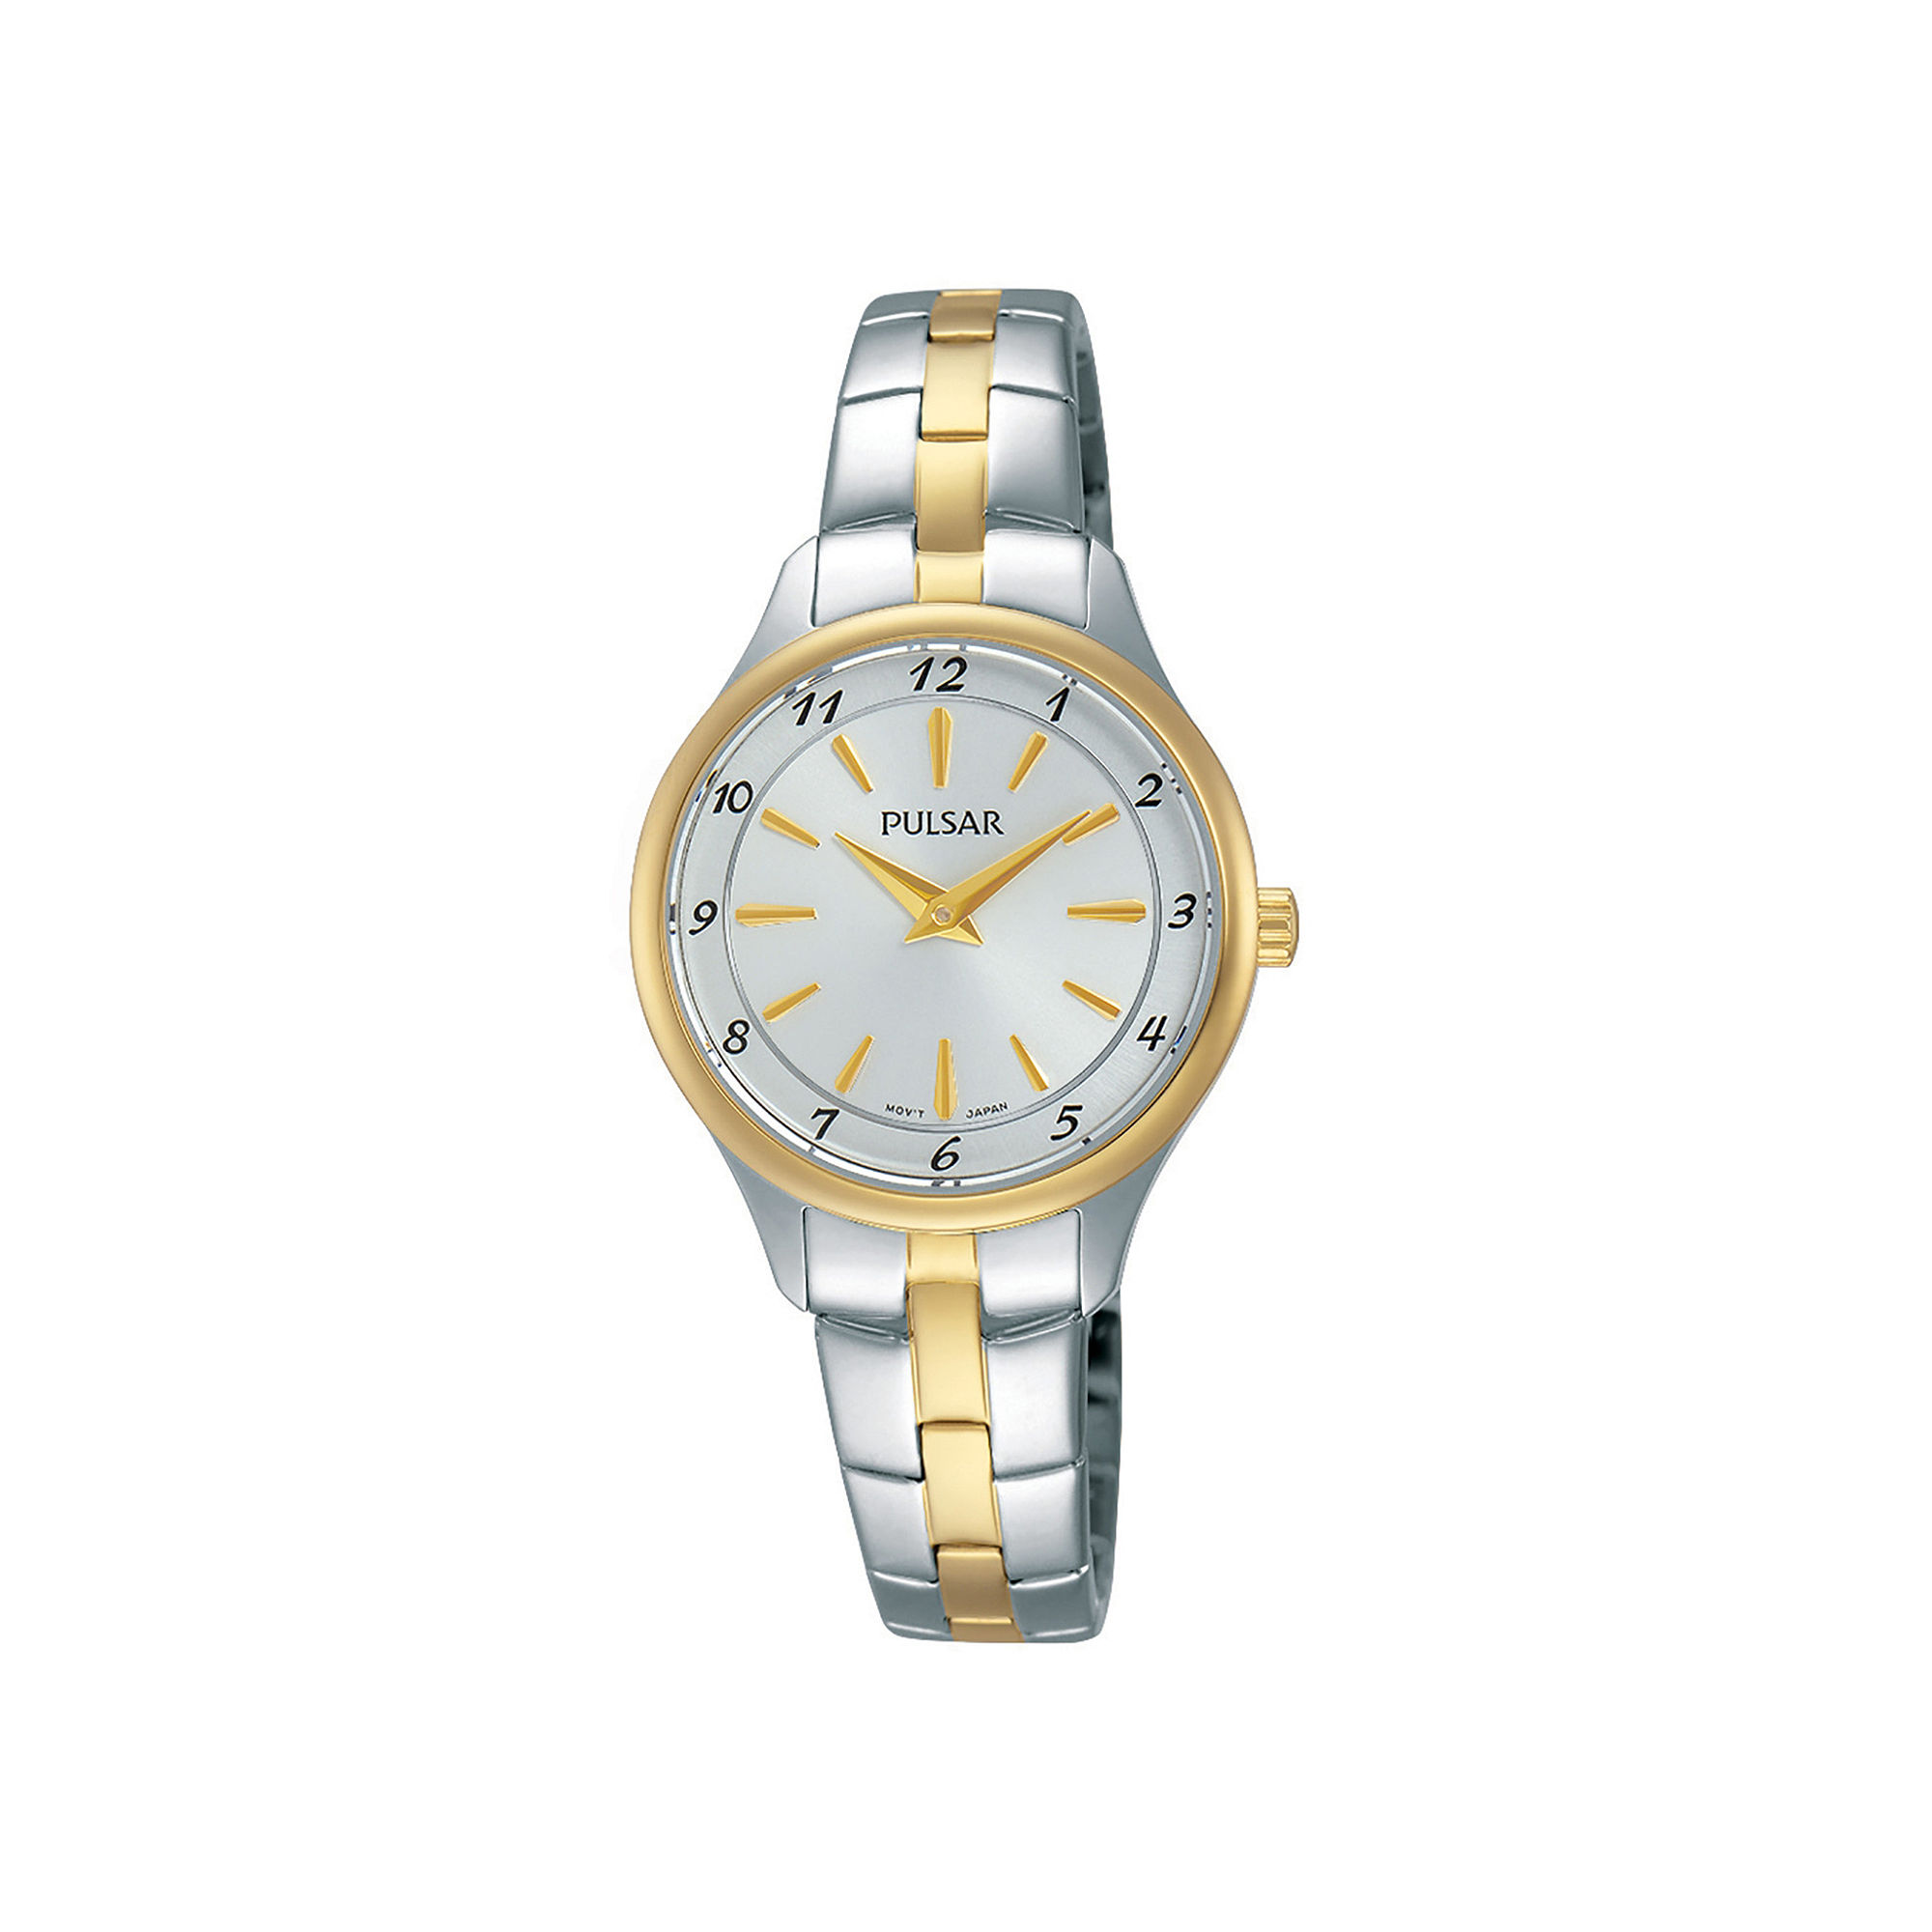 Pulsar Womens Two-Tone Stainless Steel Bracelet Watch